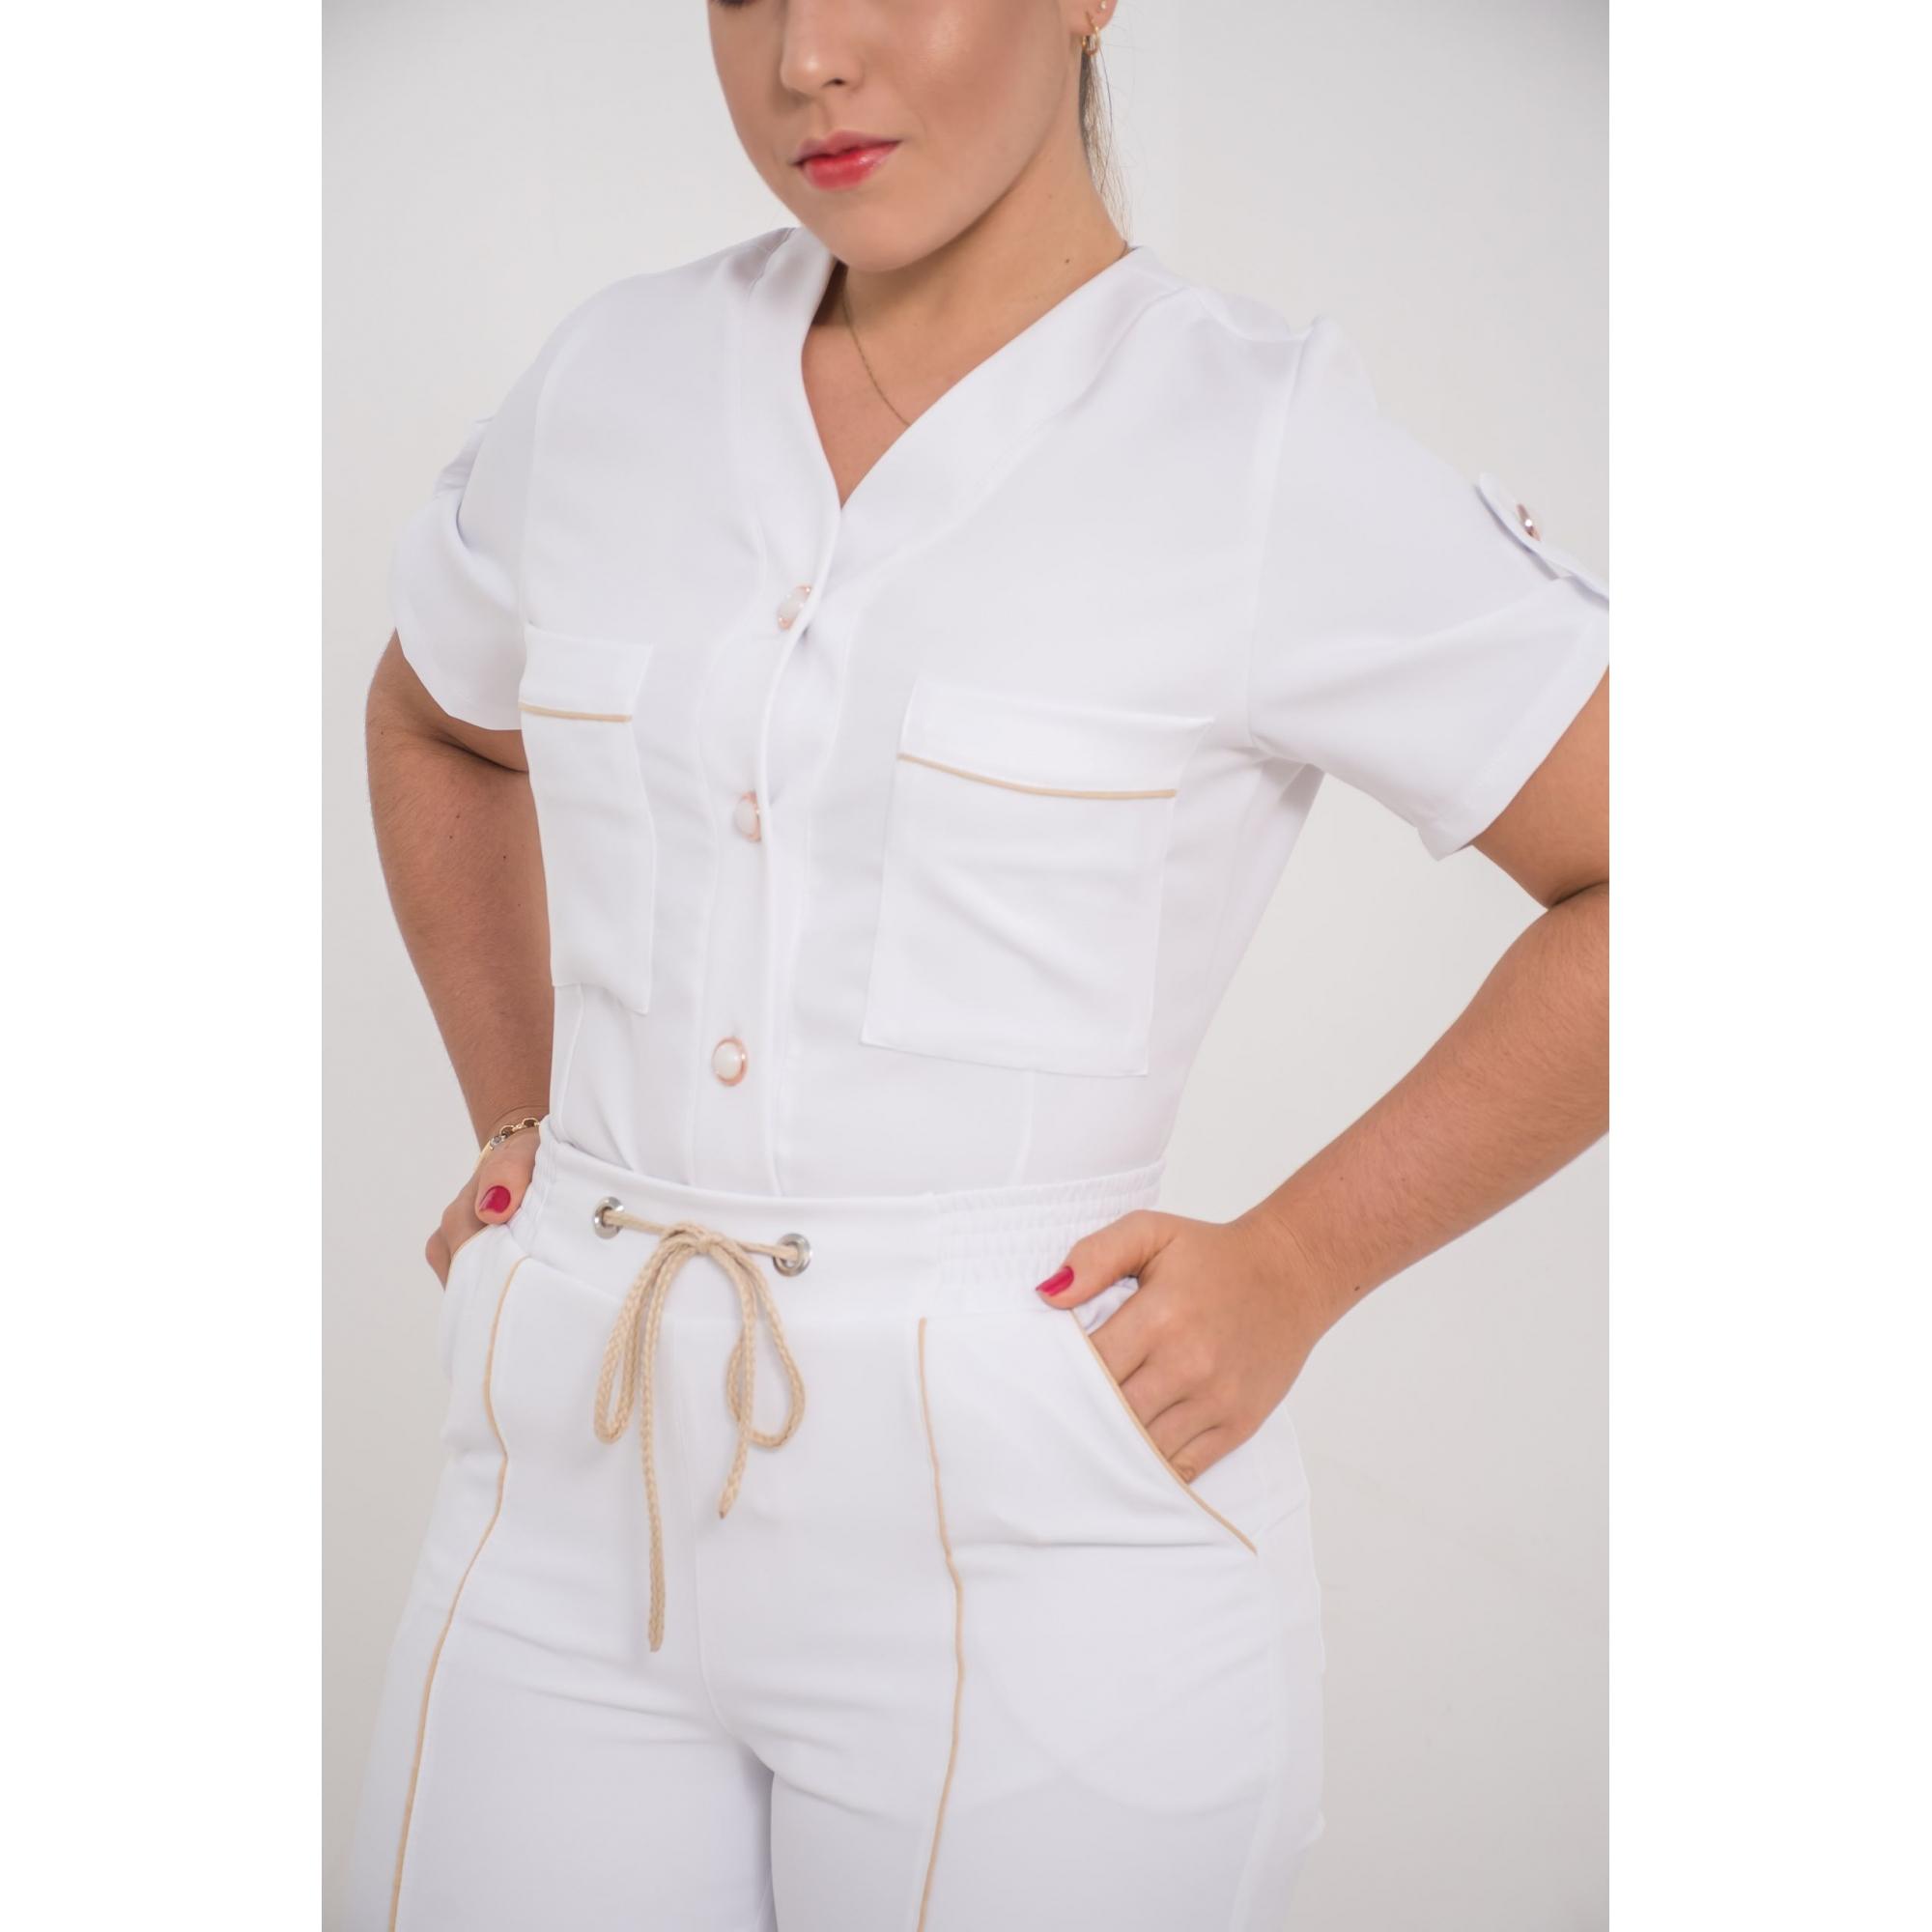 Scrub Feminino Bruna  - Luxo Branco - Jalecos Personalizado Feminino